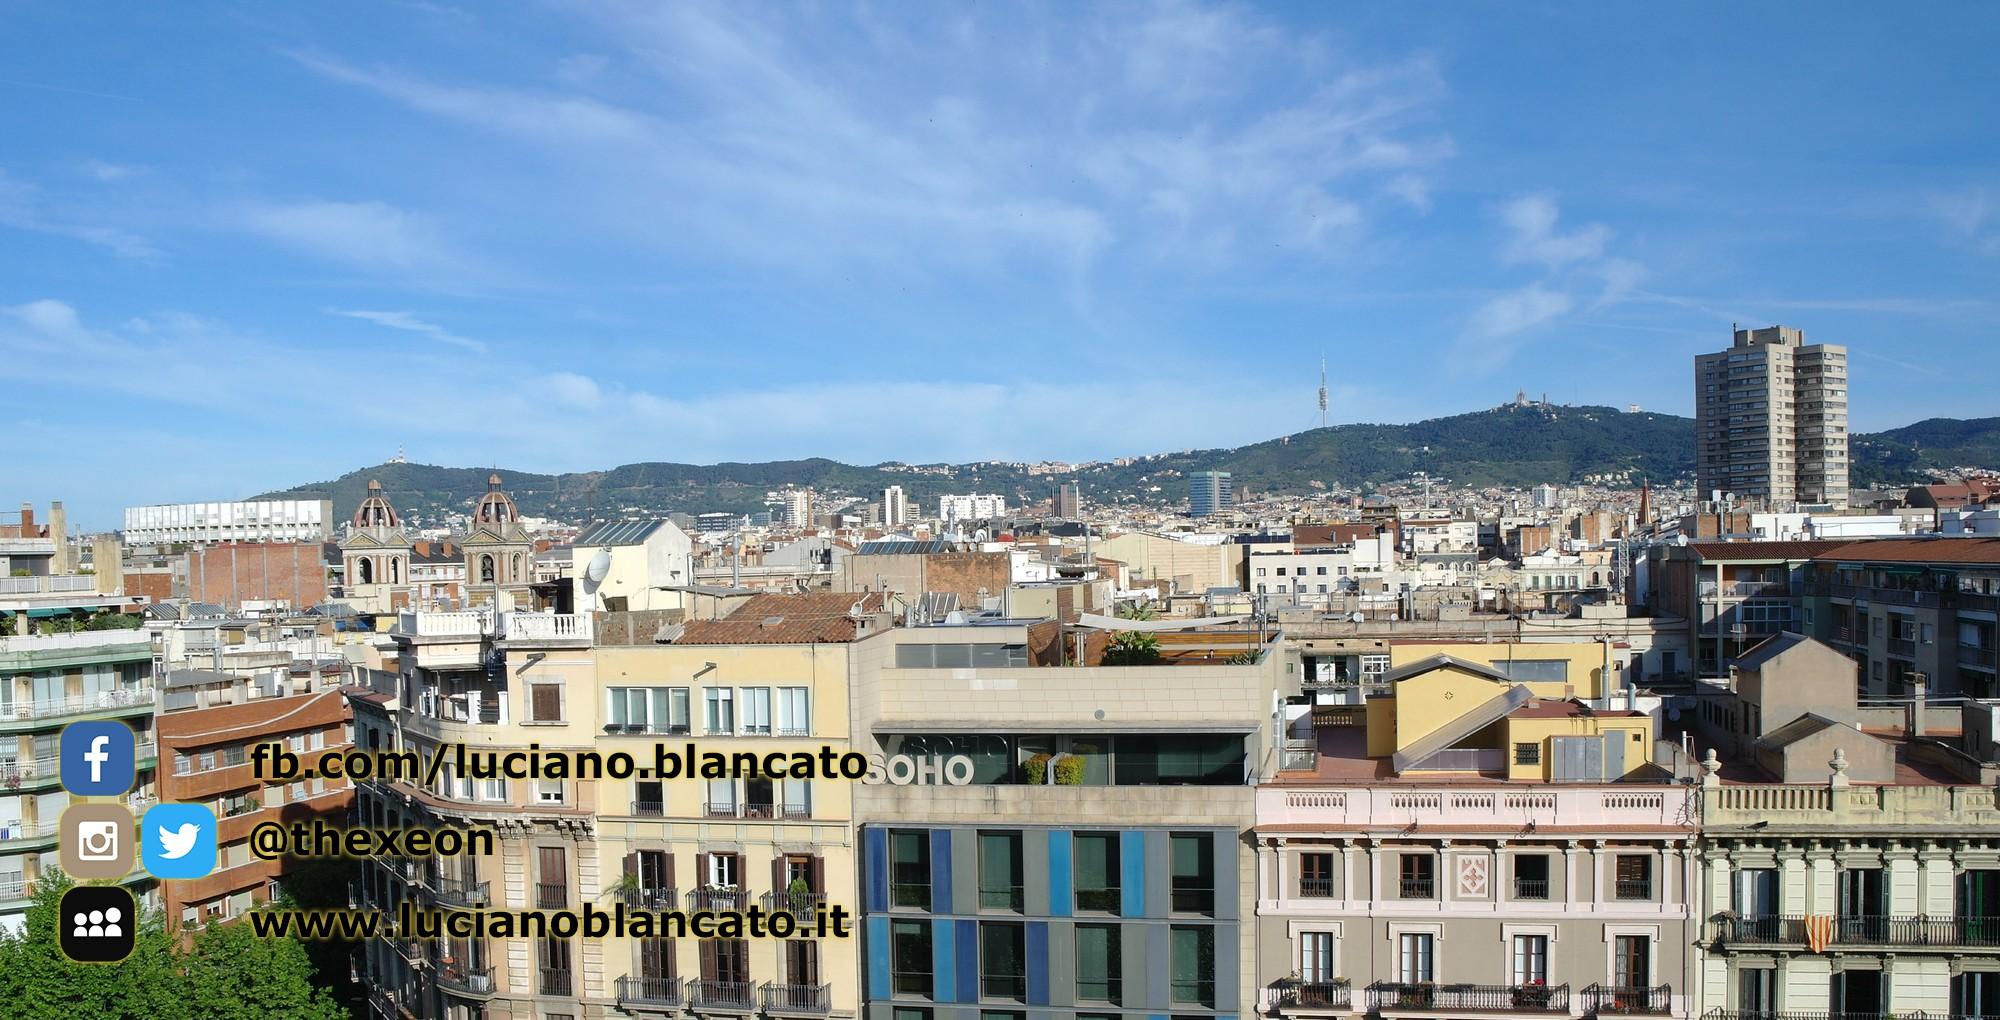 W1 Vueling a Barcellona - 2014 - foto n 0117